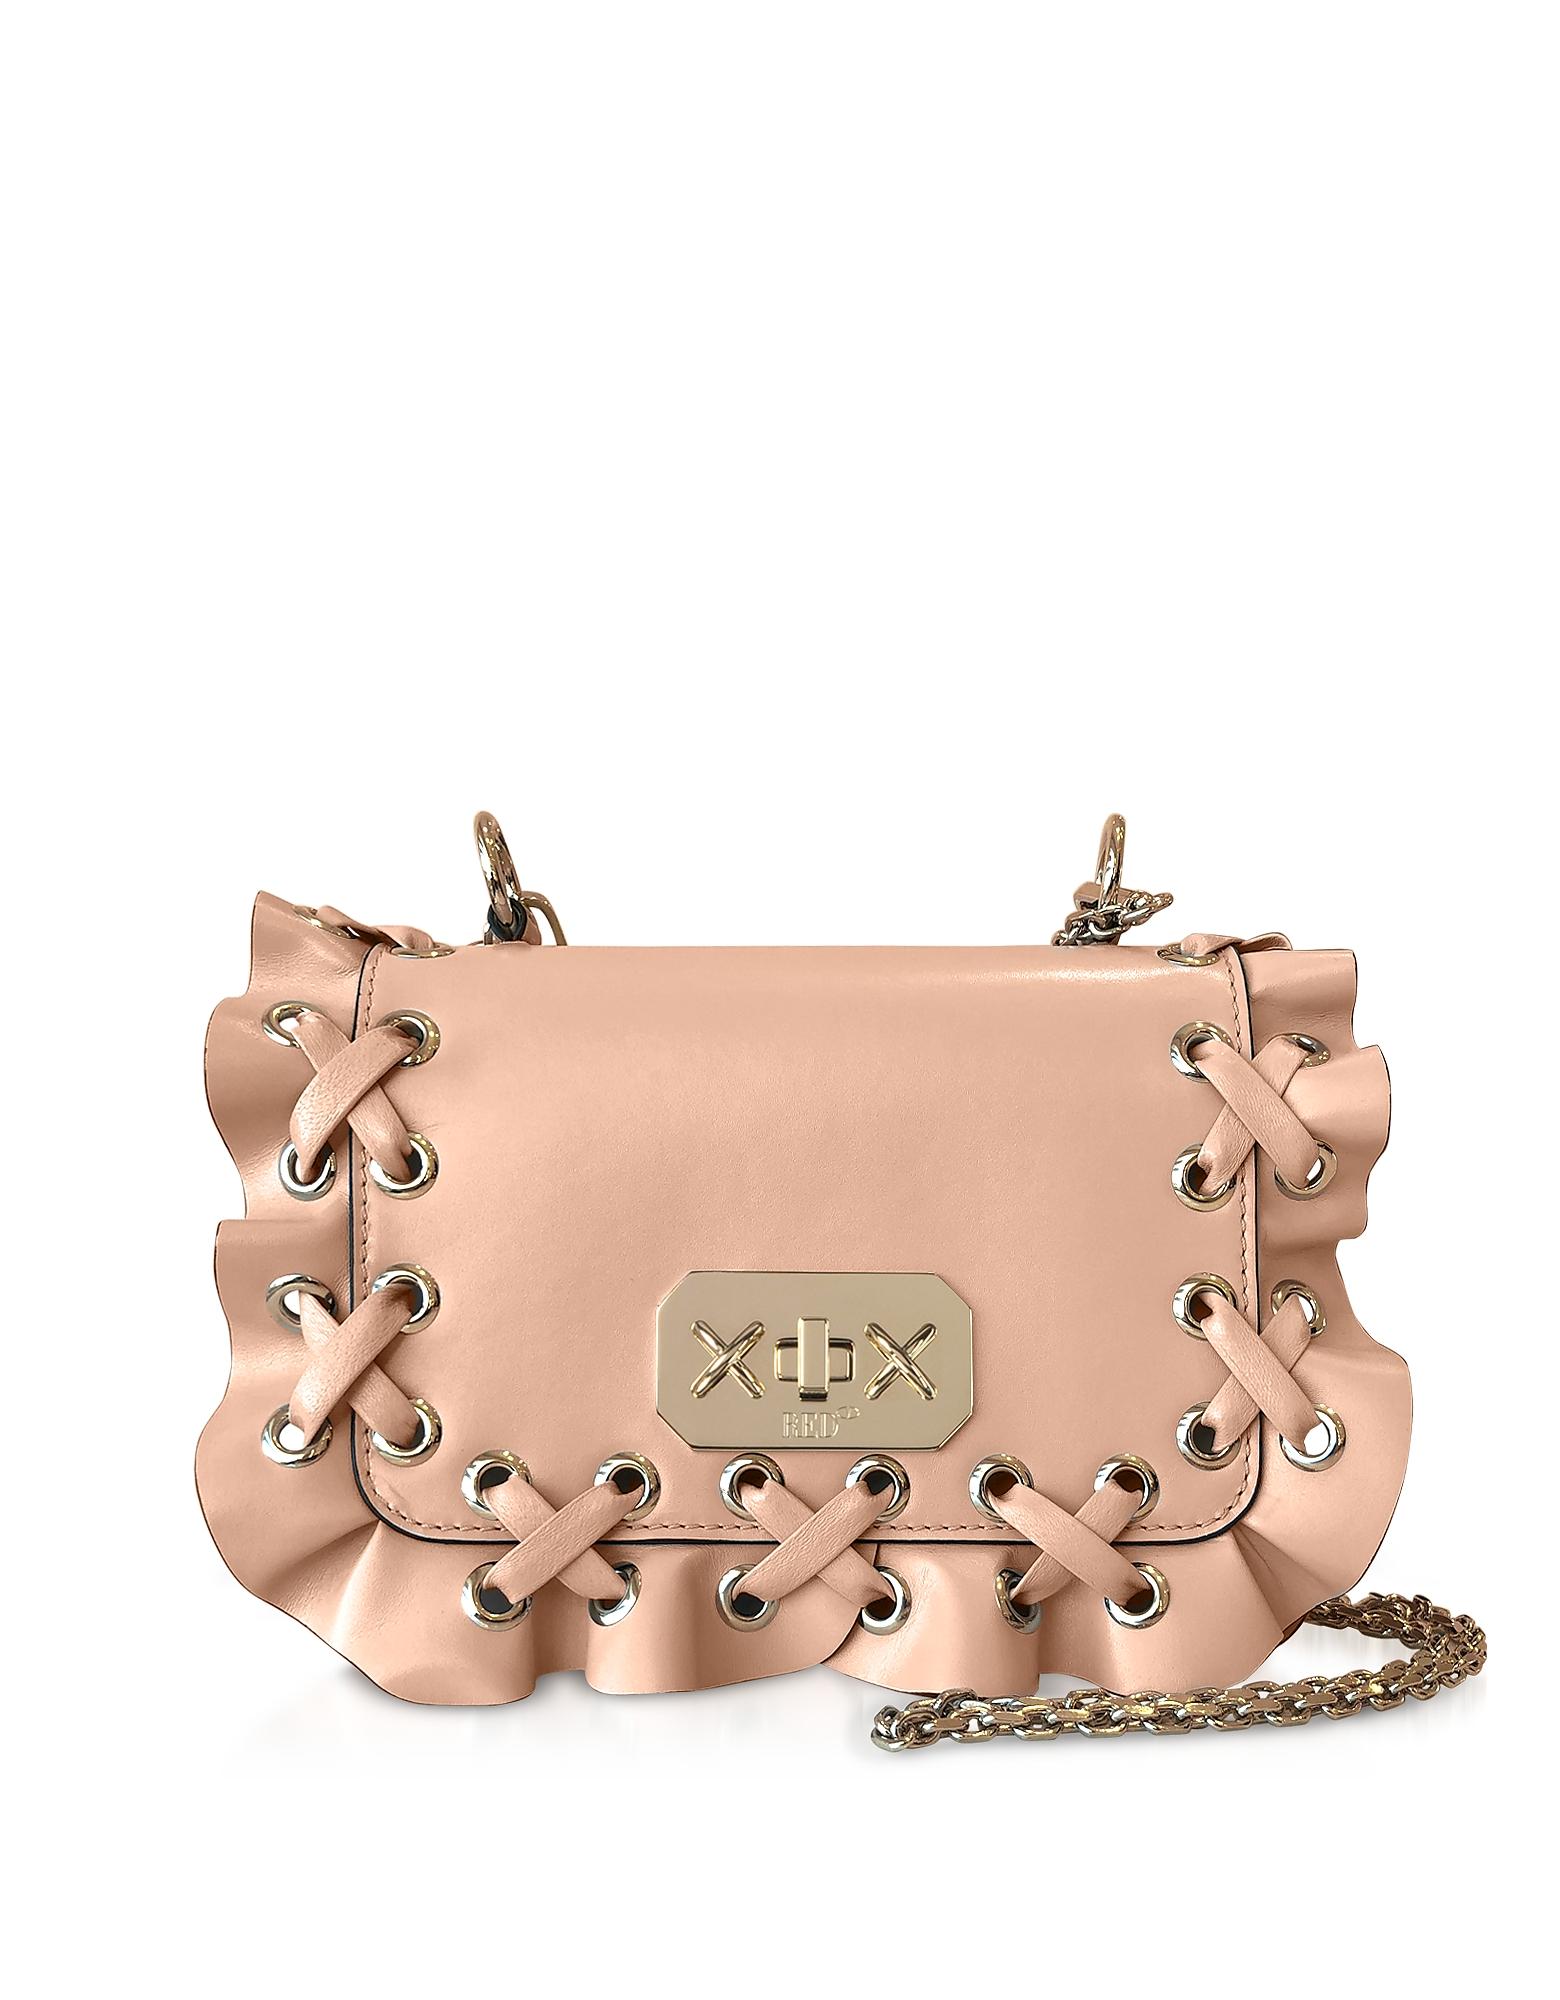 REDVALENTINO   RED Valentino Designer Handbags, Skin Leather Rock Ruffle Bag   Goxip